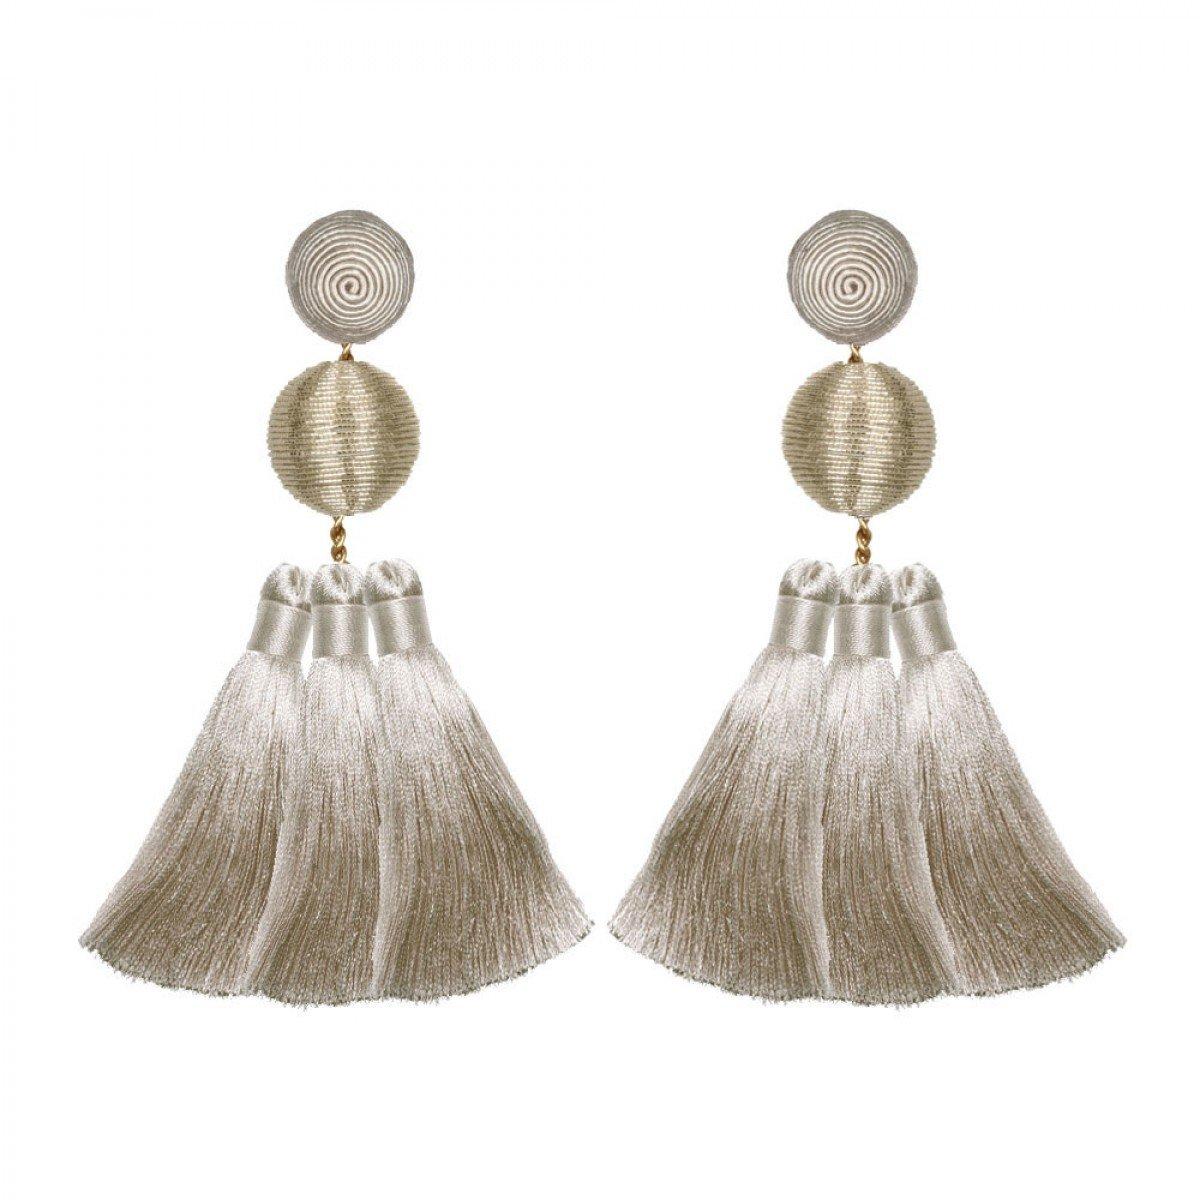 Triple Tassel Grey Earrings by SUZANNA DAI